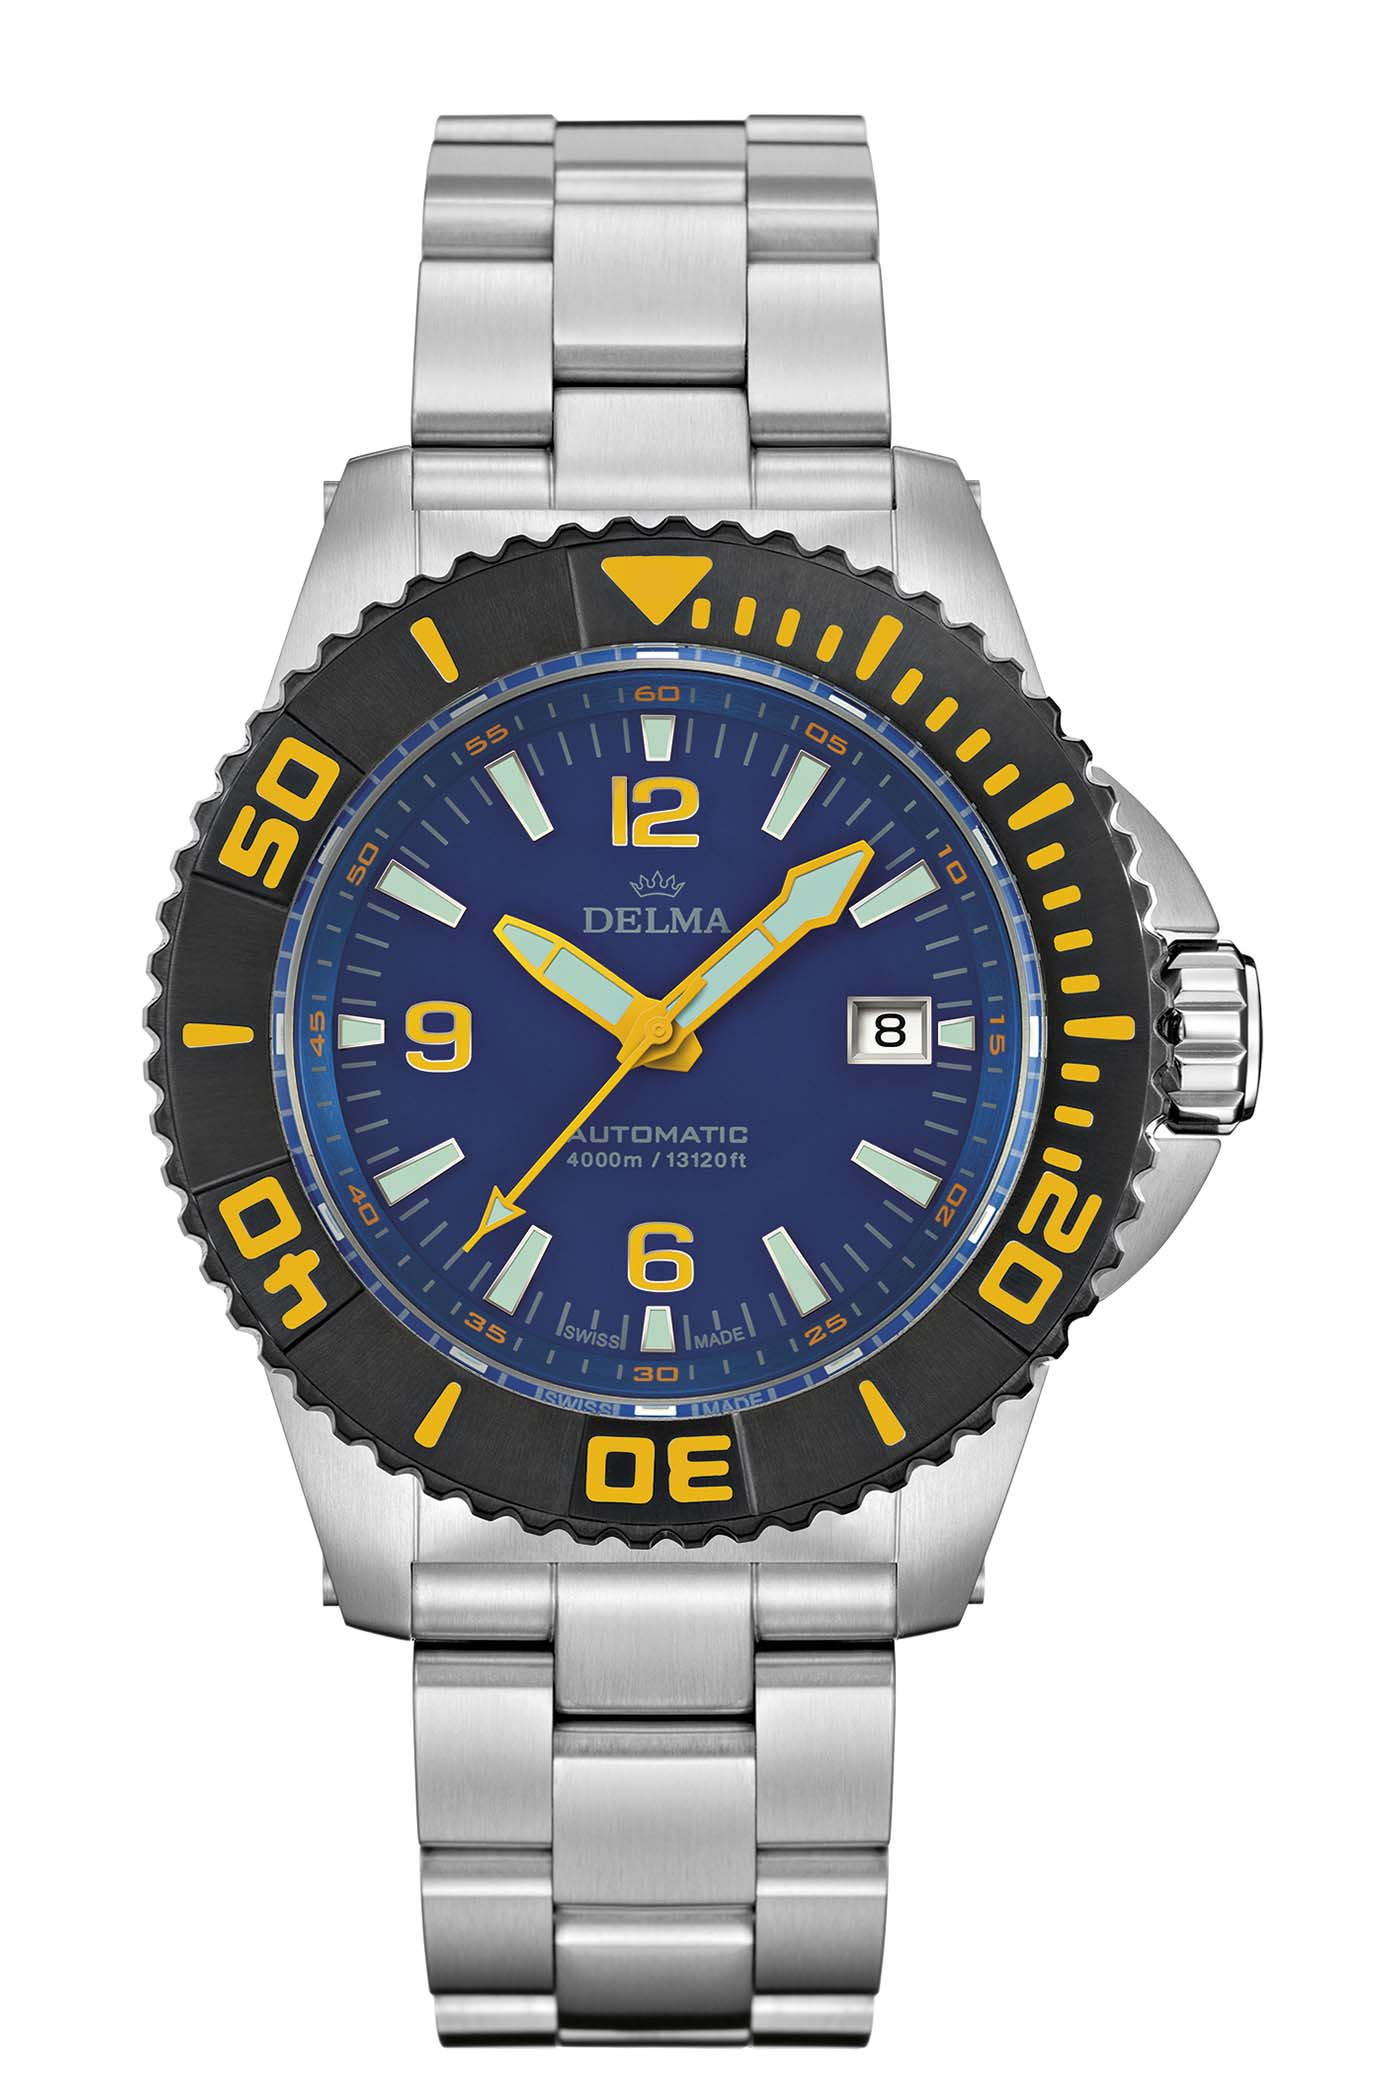 Delma Blue Shark III 4000m Water Resistant - 6